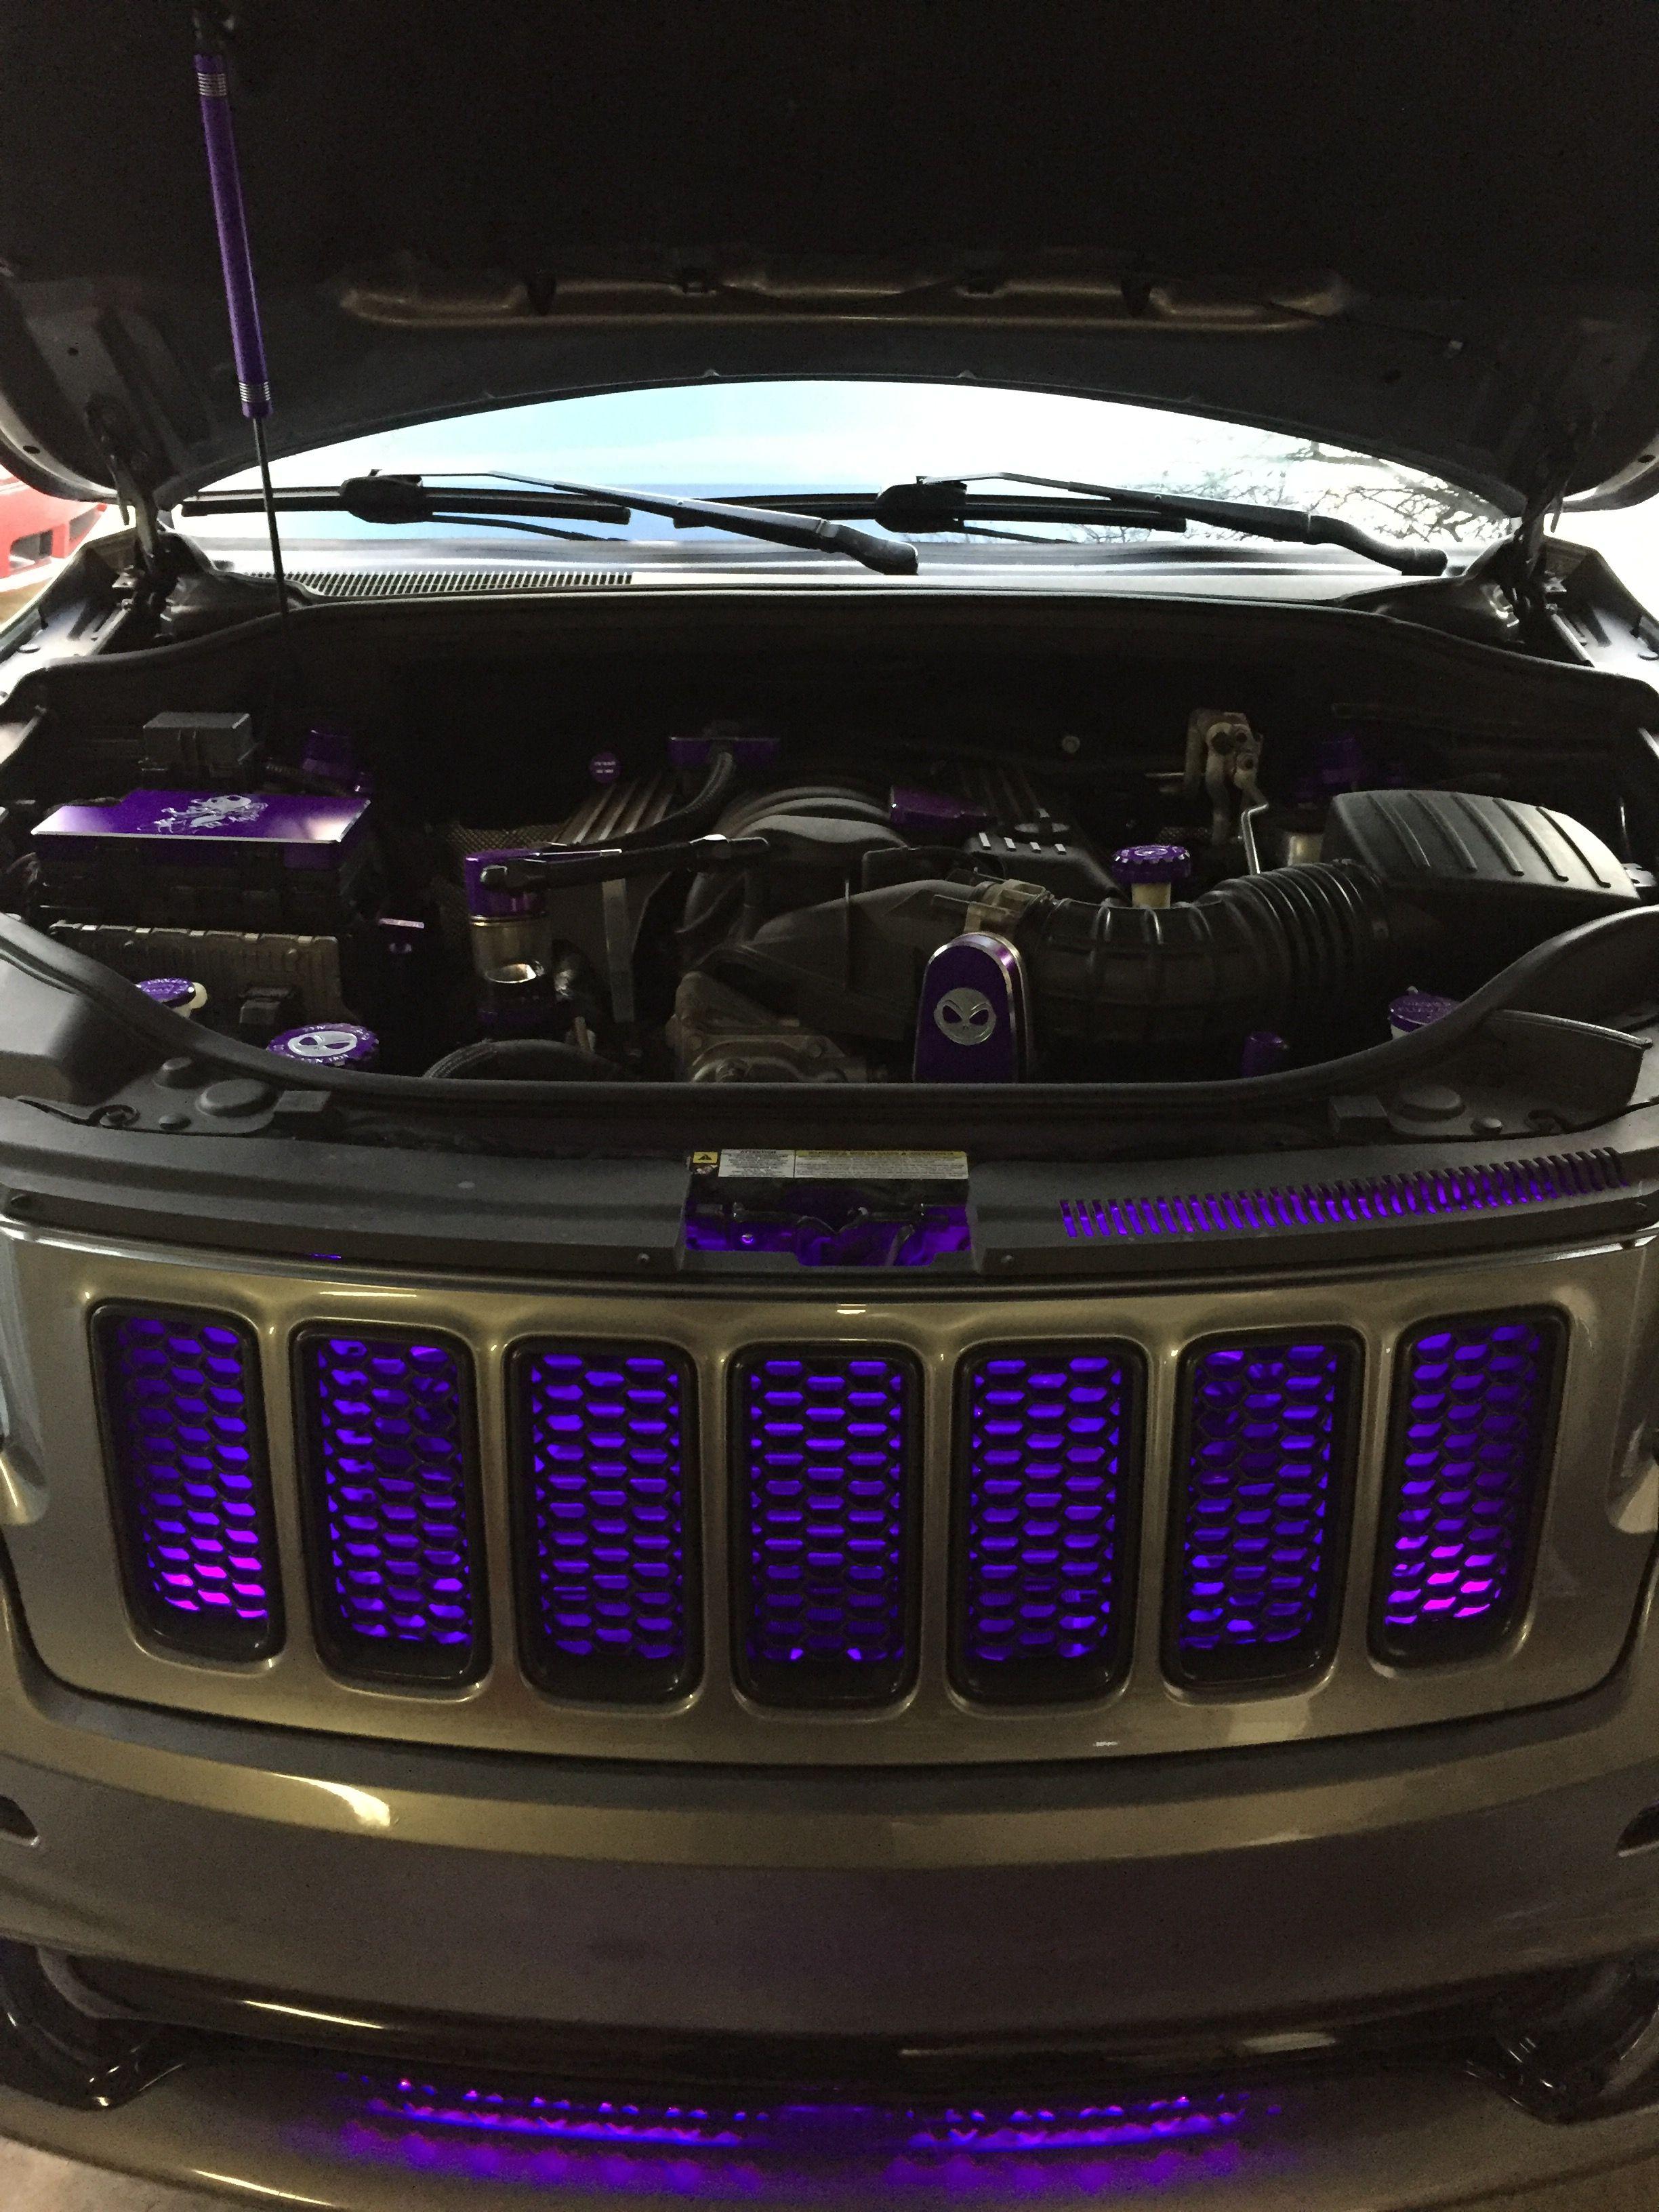 medium resolution of 2012 jeep grand cherokee srt8 graphite with purple grill lights and purple billet technology under hood trim kit